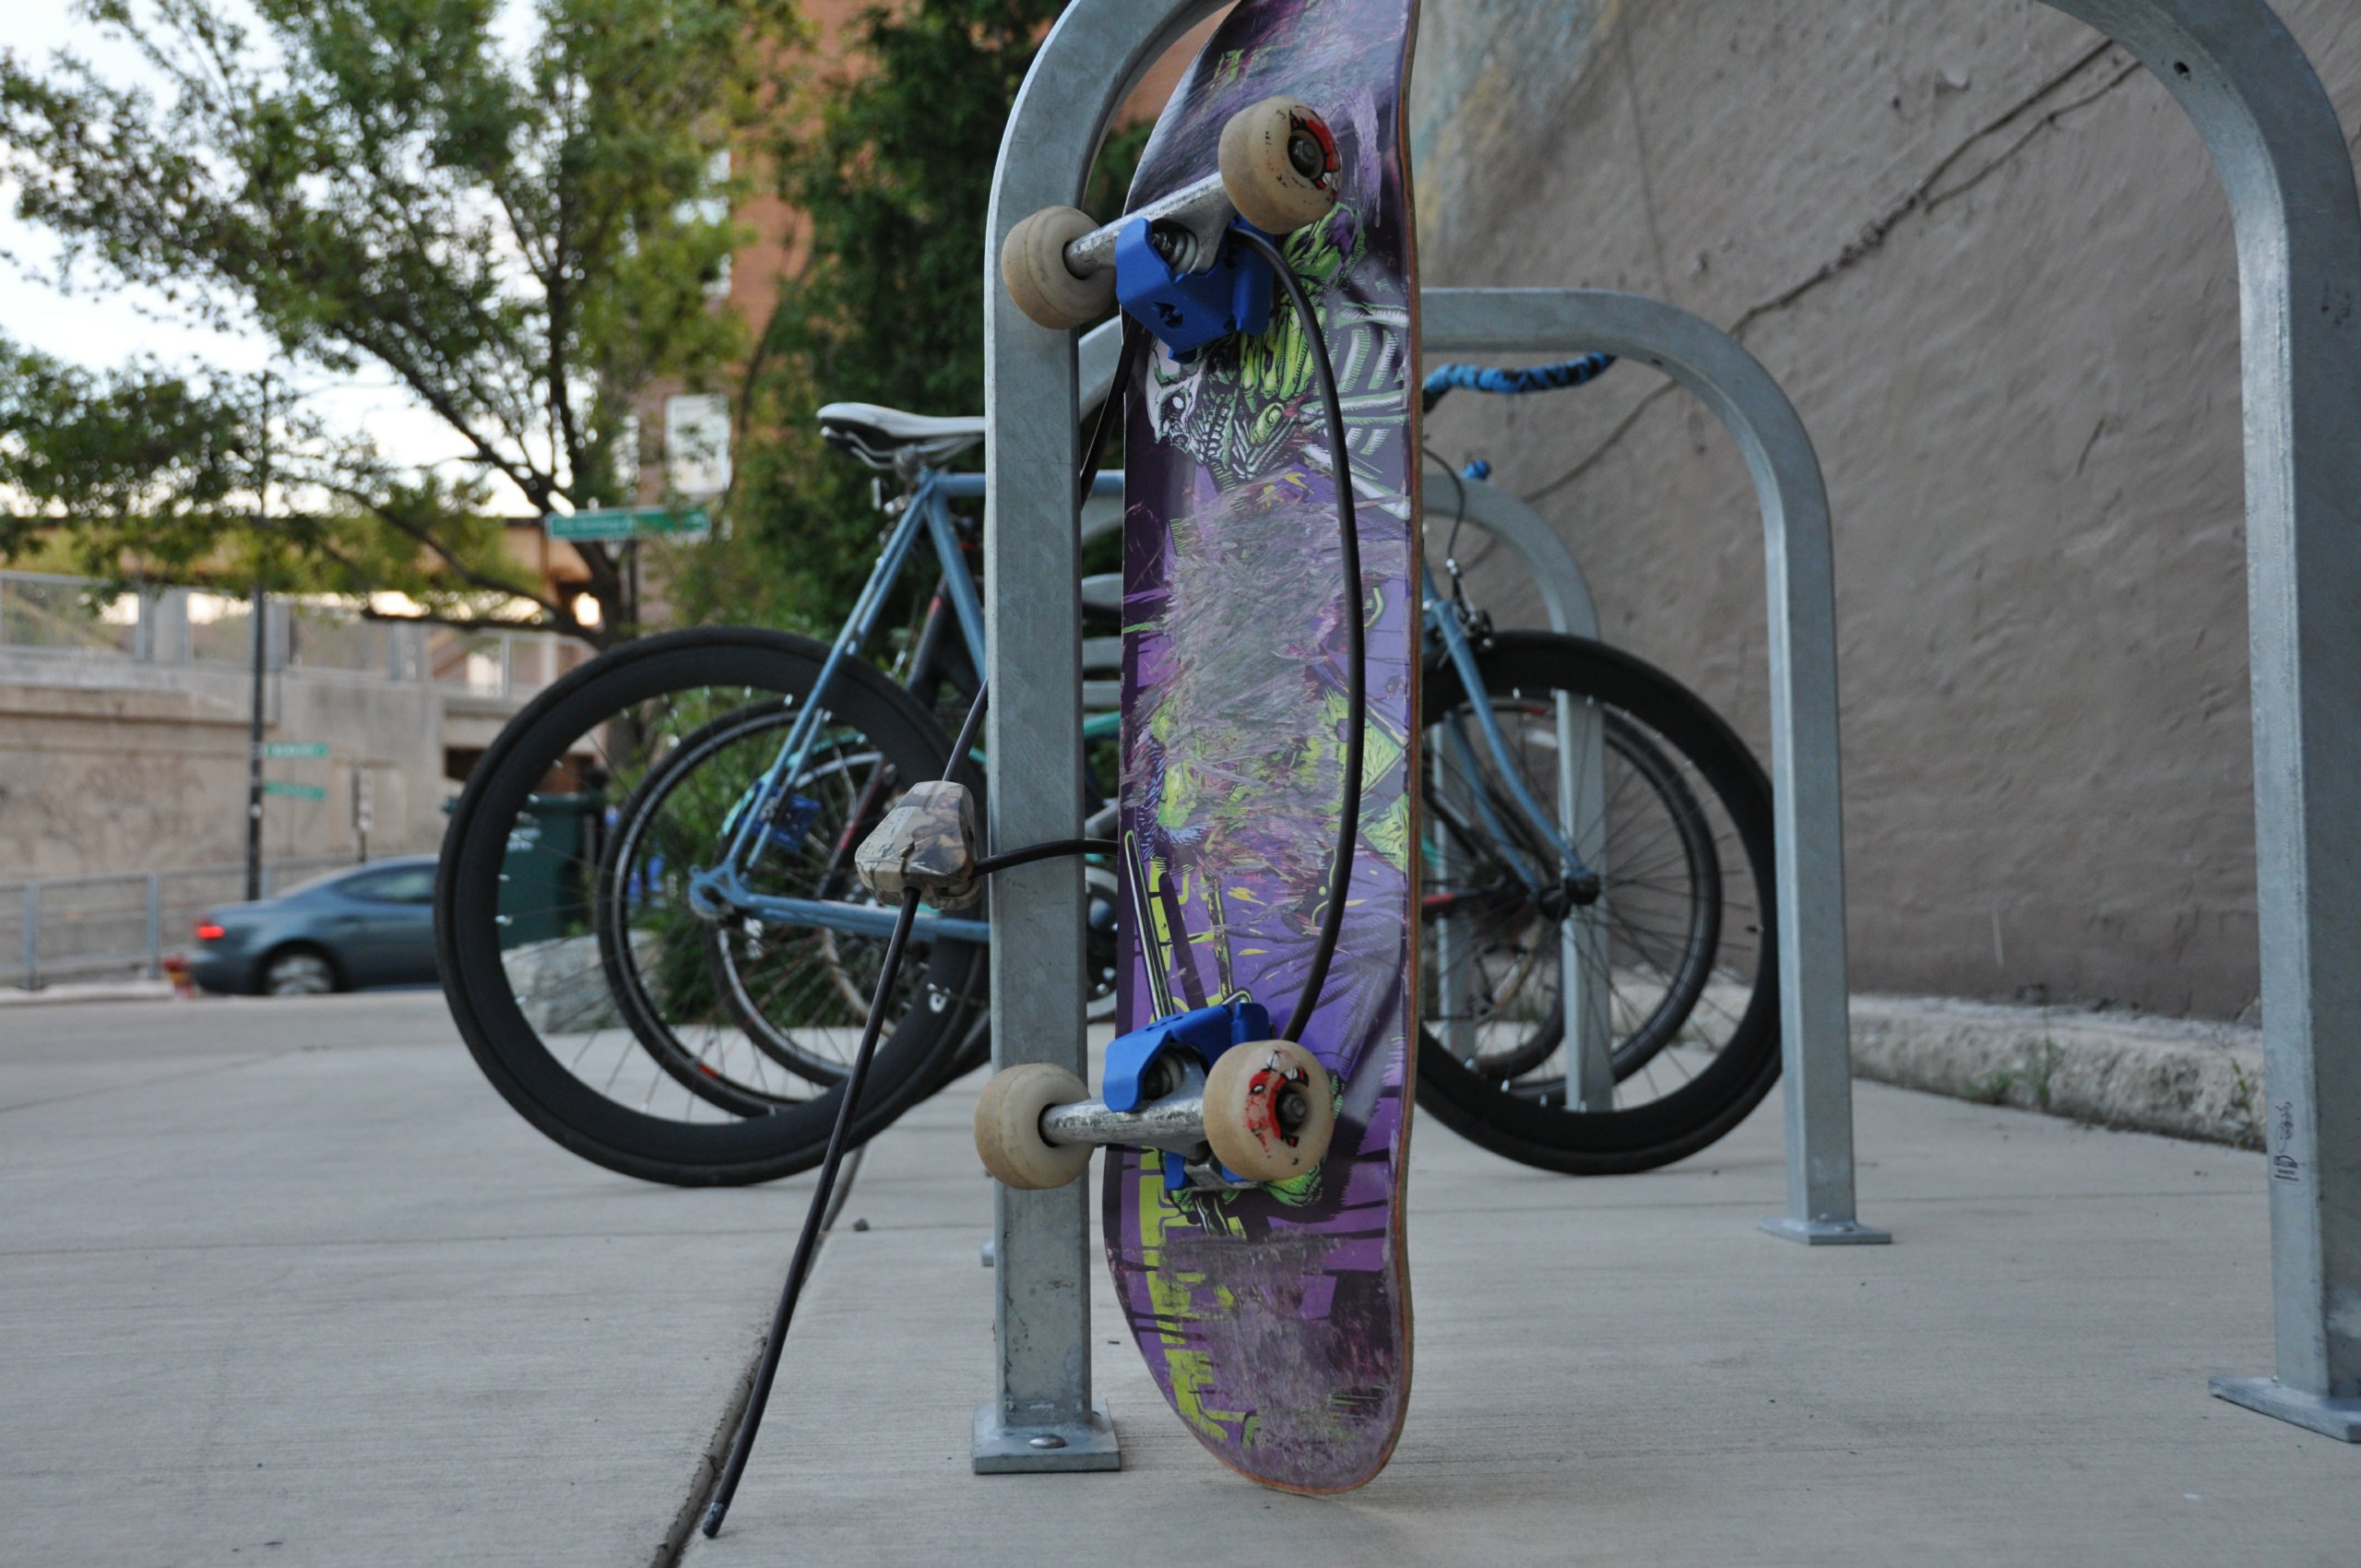 Accrocher son skateboard son bike c 39 est possible - Accrocher velo au mur ...